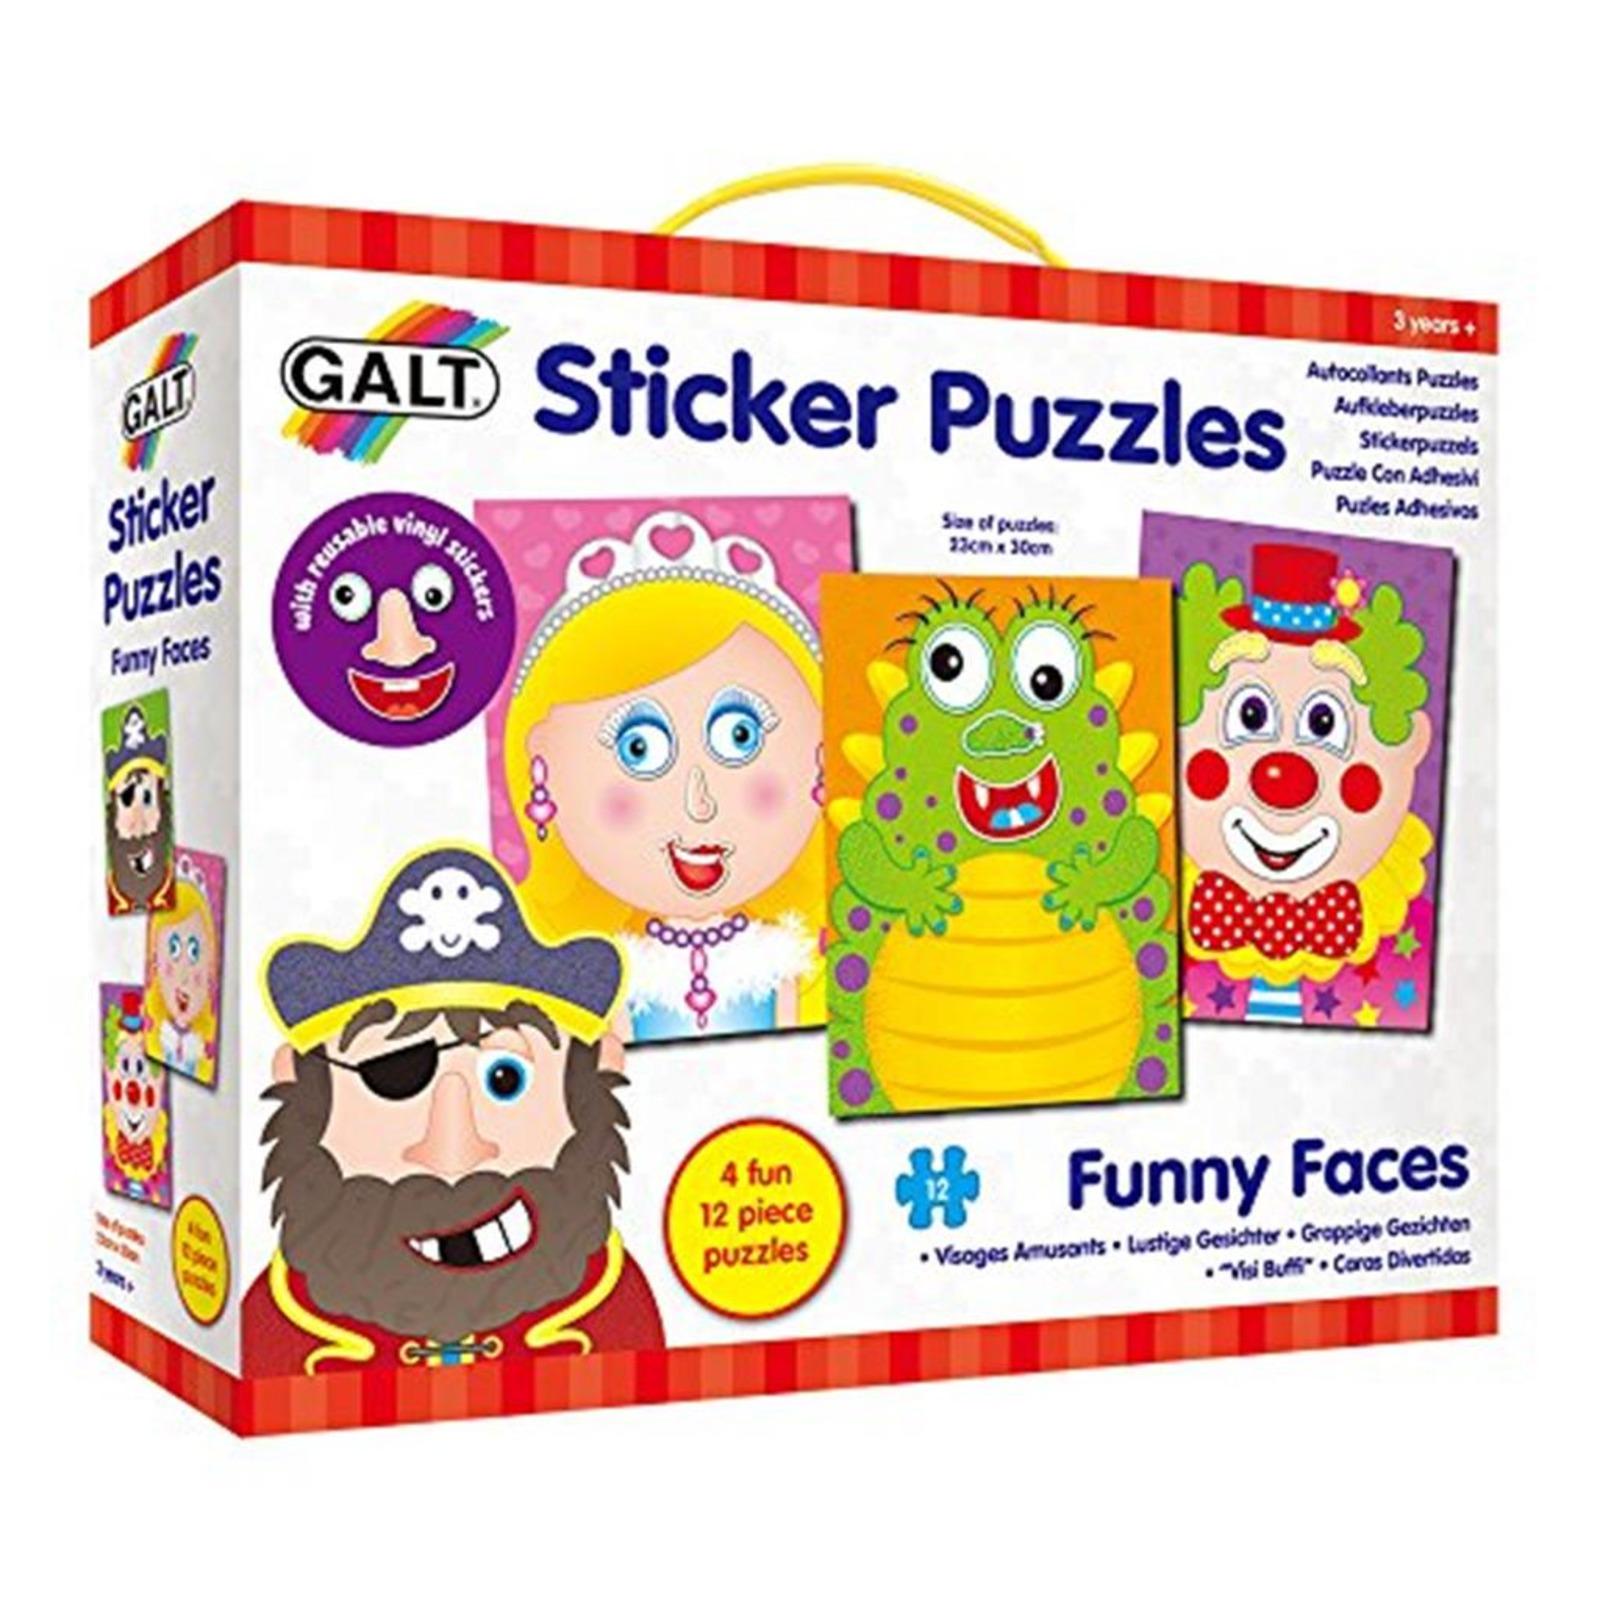 GALT Sticker Puzzles - Funny Faces